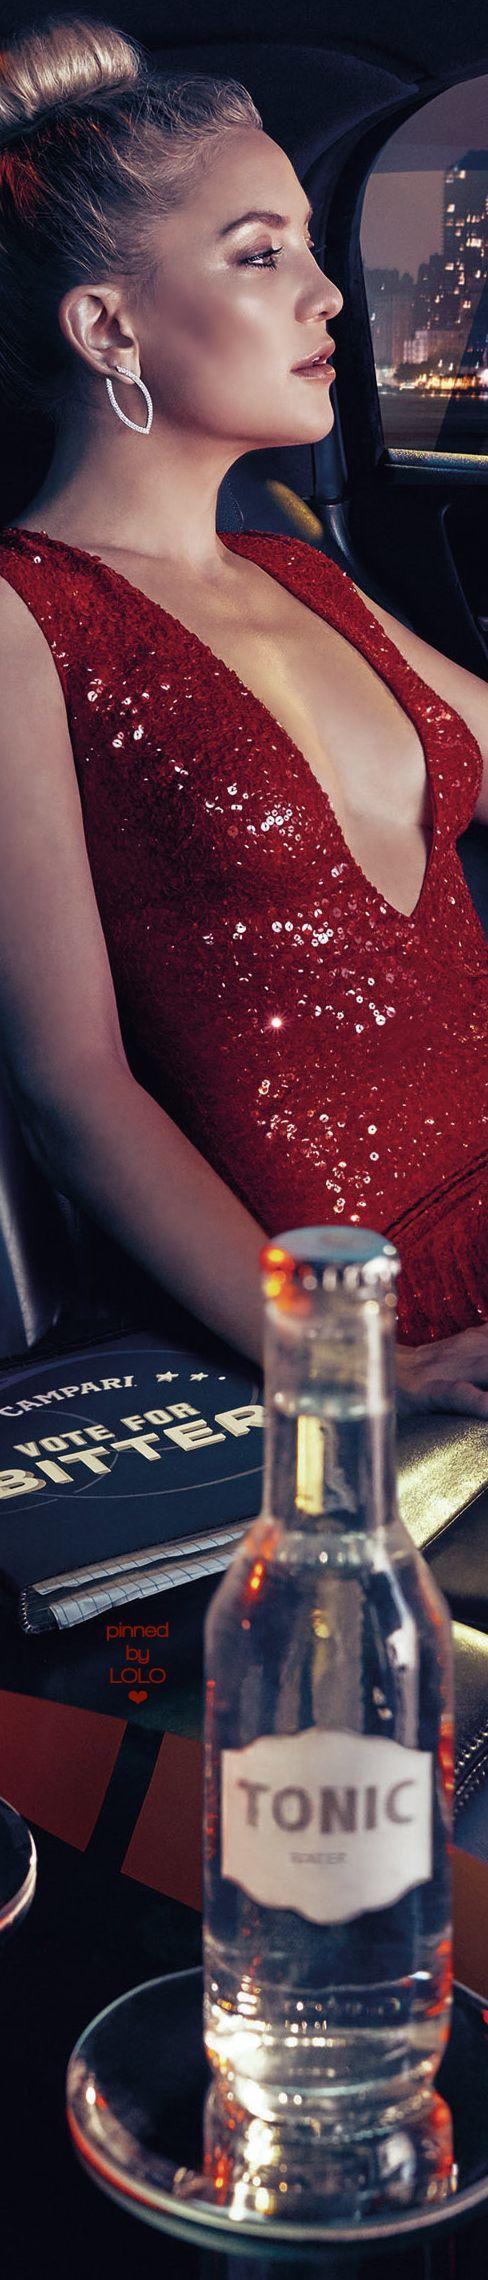 Kate Hudson for Campari 2016 Calendar | LOLO❤︎